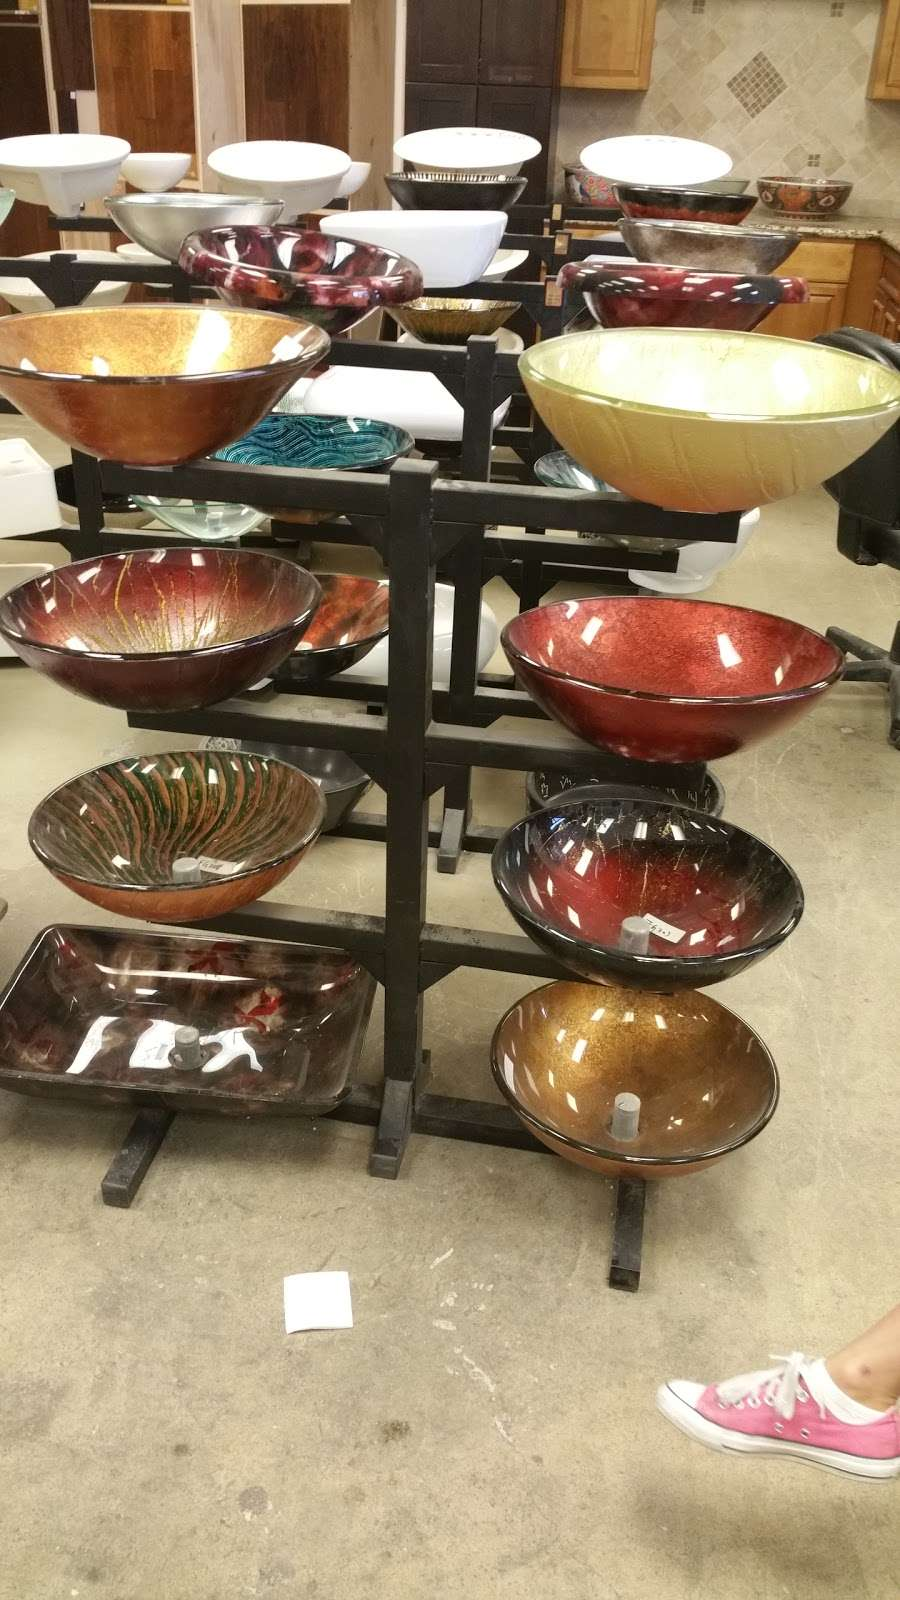 Granite Master - home goods store  | Photo 9 of 10 | Address: 4502 Steffani Ln, Houston, TX 77041, USA | Phone: (713) 983-6446